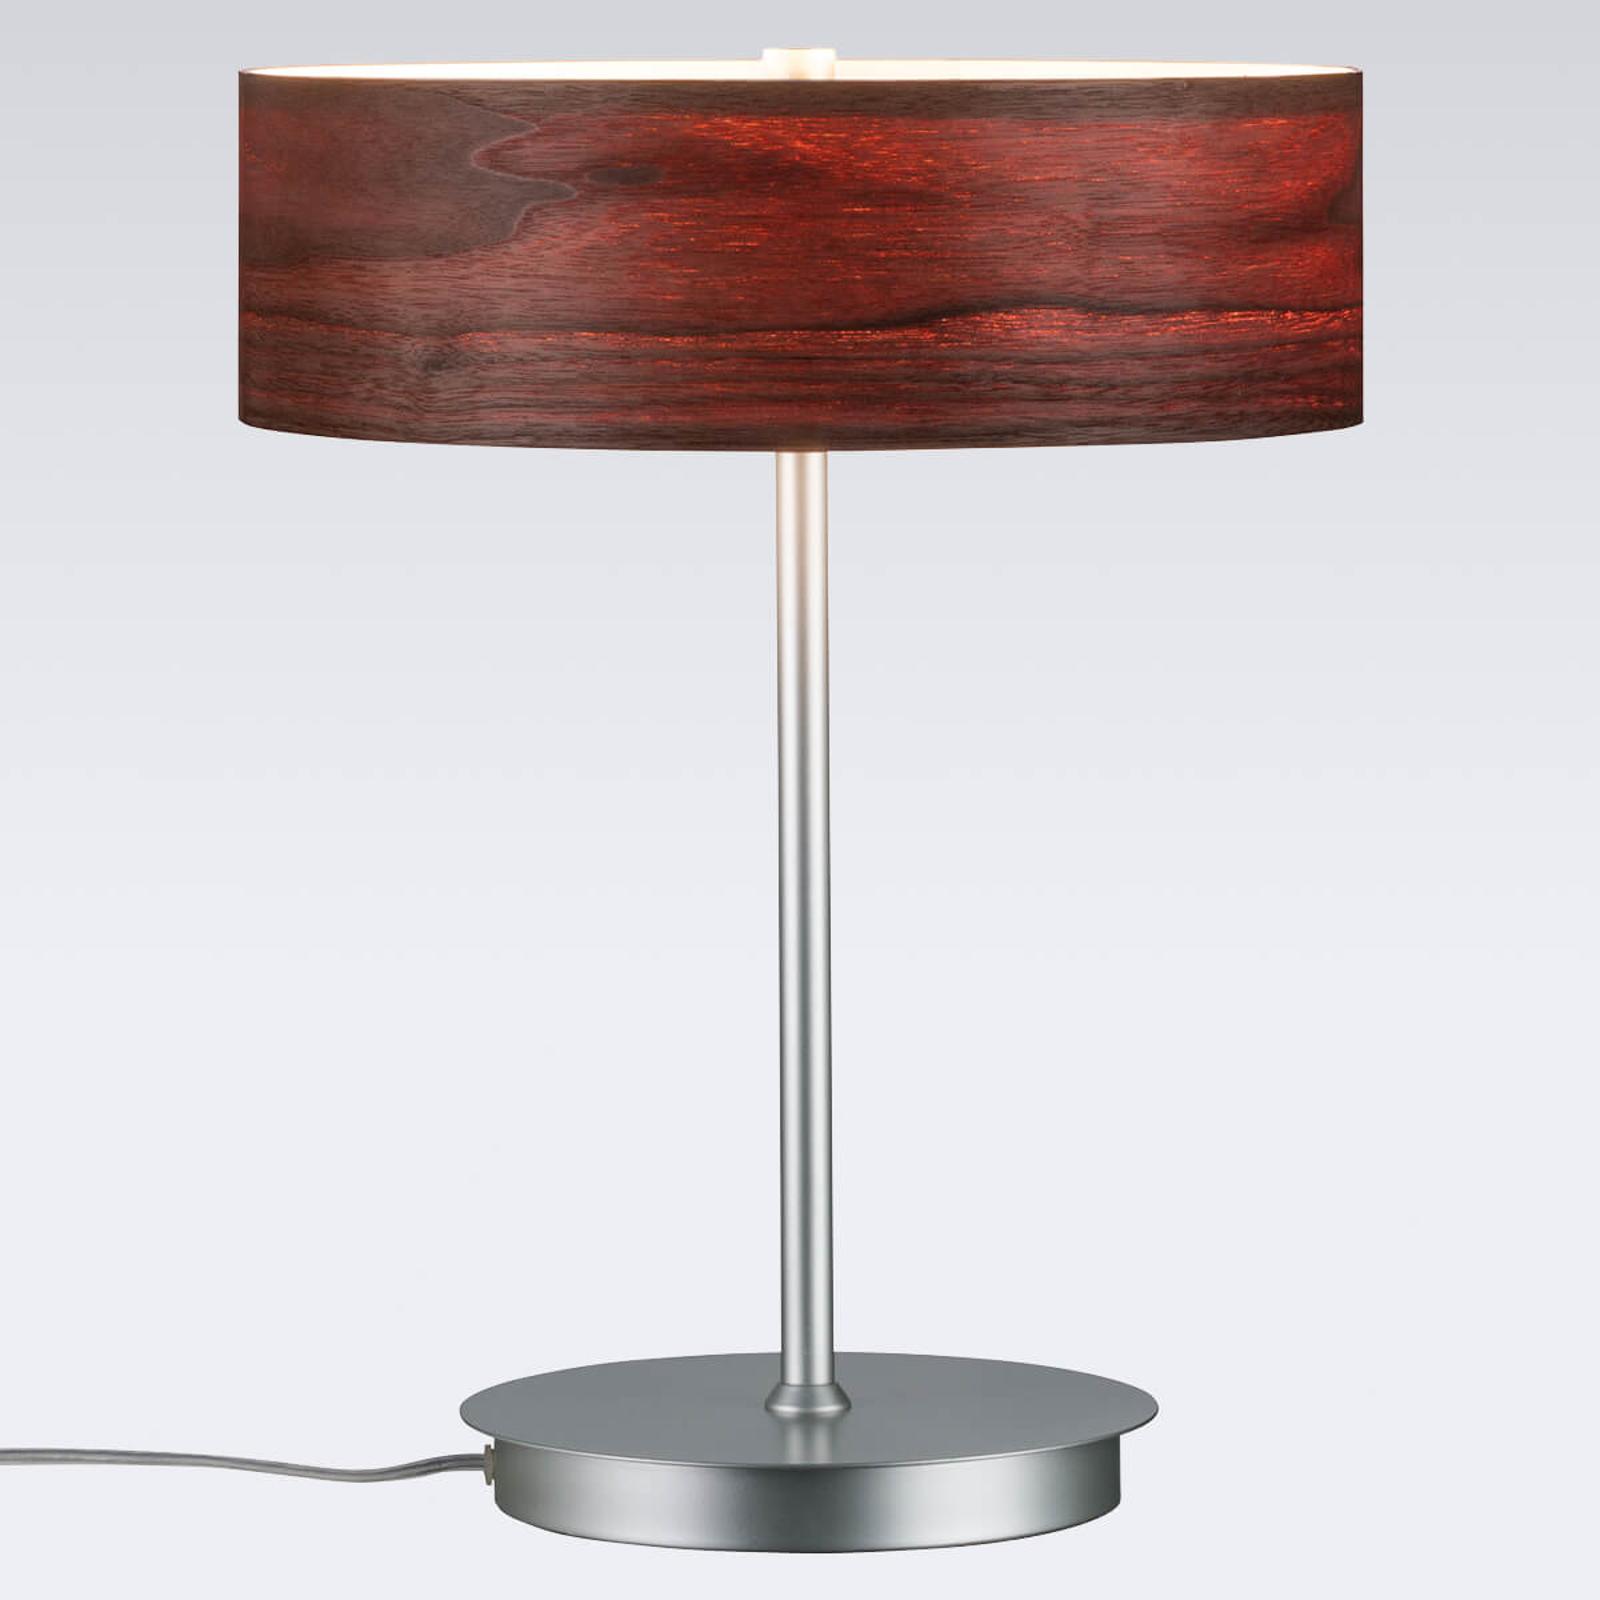 Liska - chique tafellamp met houten kap